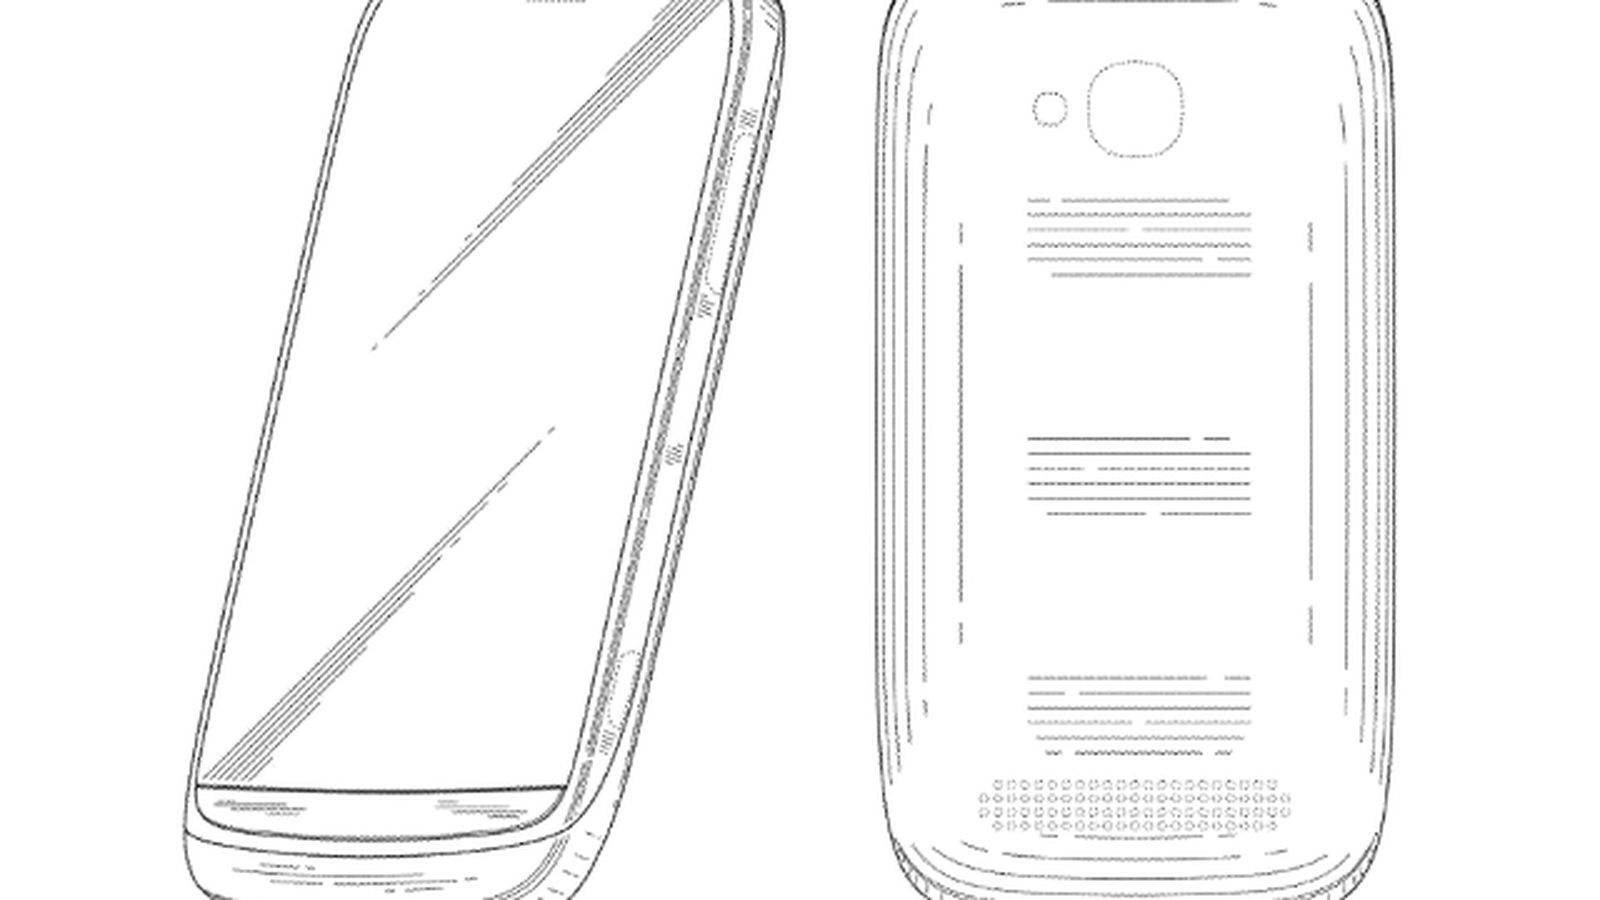 New Nokia patent reveals possible 'Lumia Arrow' design